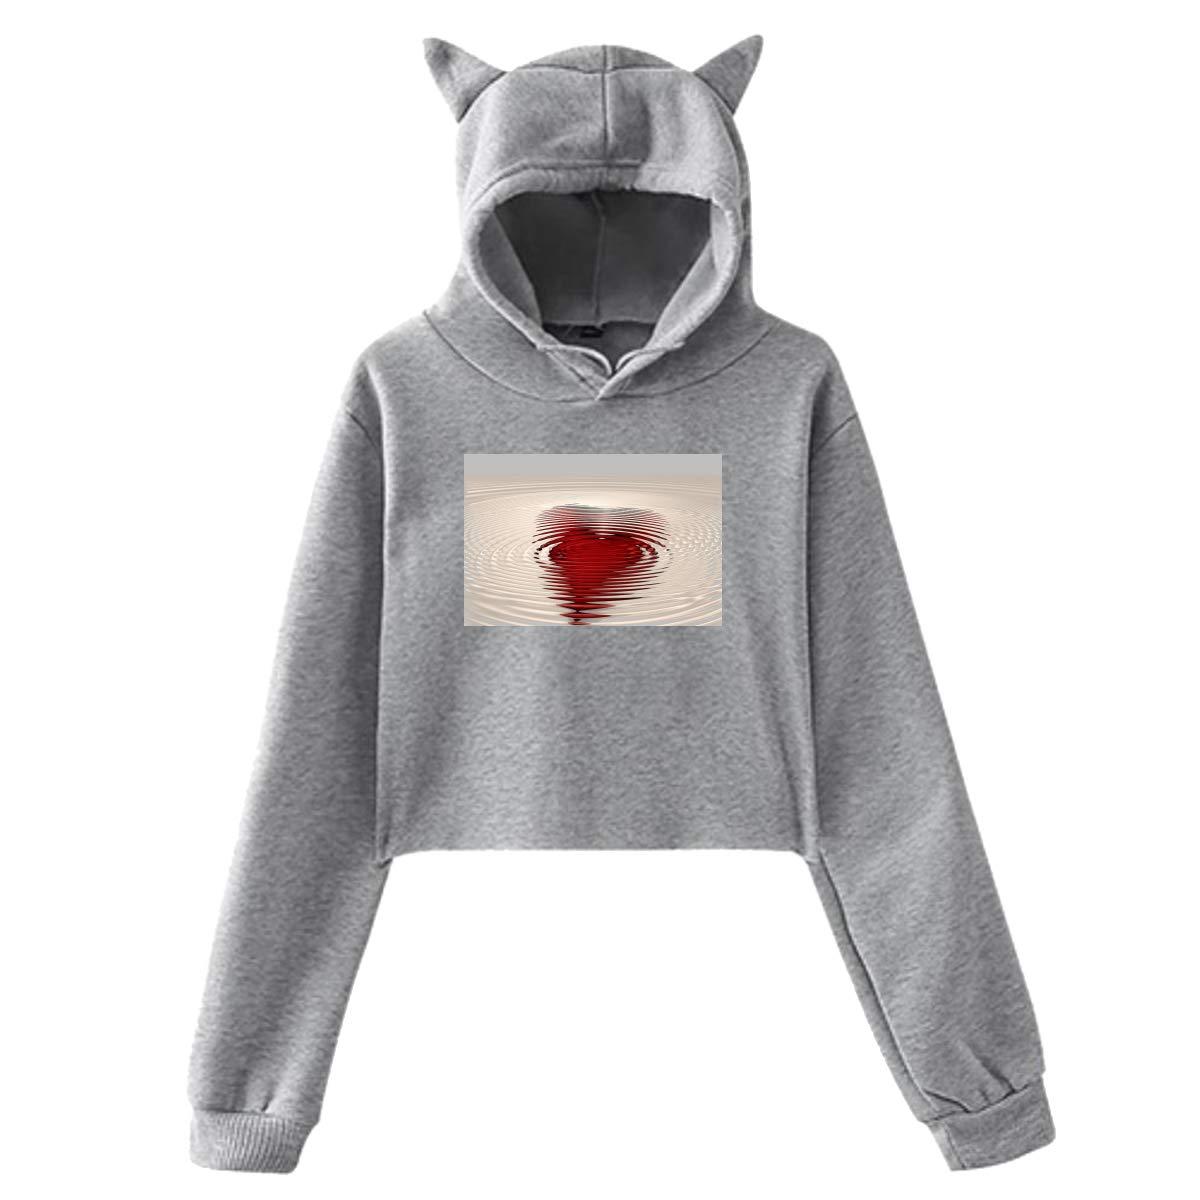 Personality Girl Cat Ears Umbilical Hoodie Fashion Sweatshirt Sweater Gray